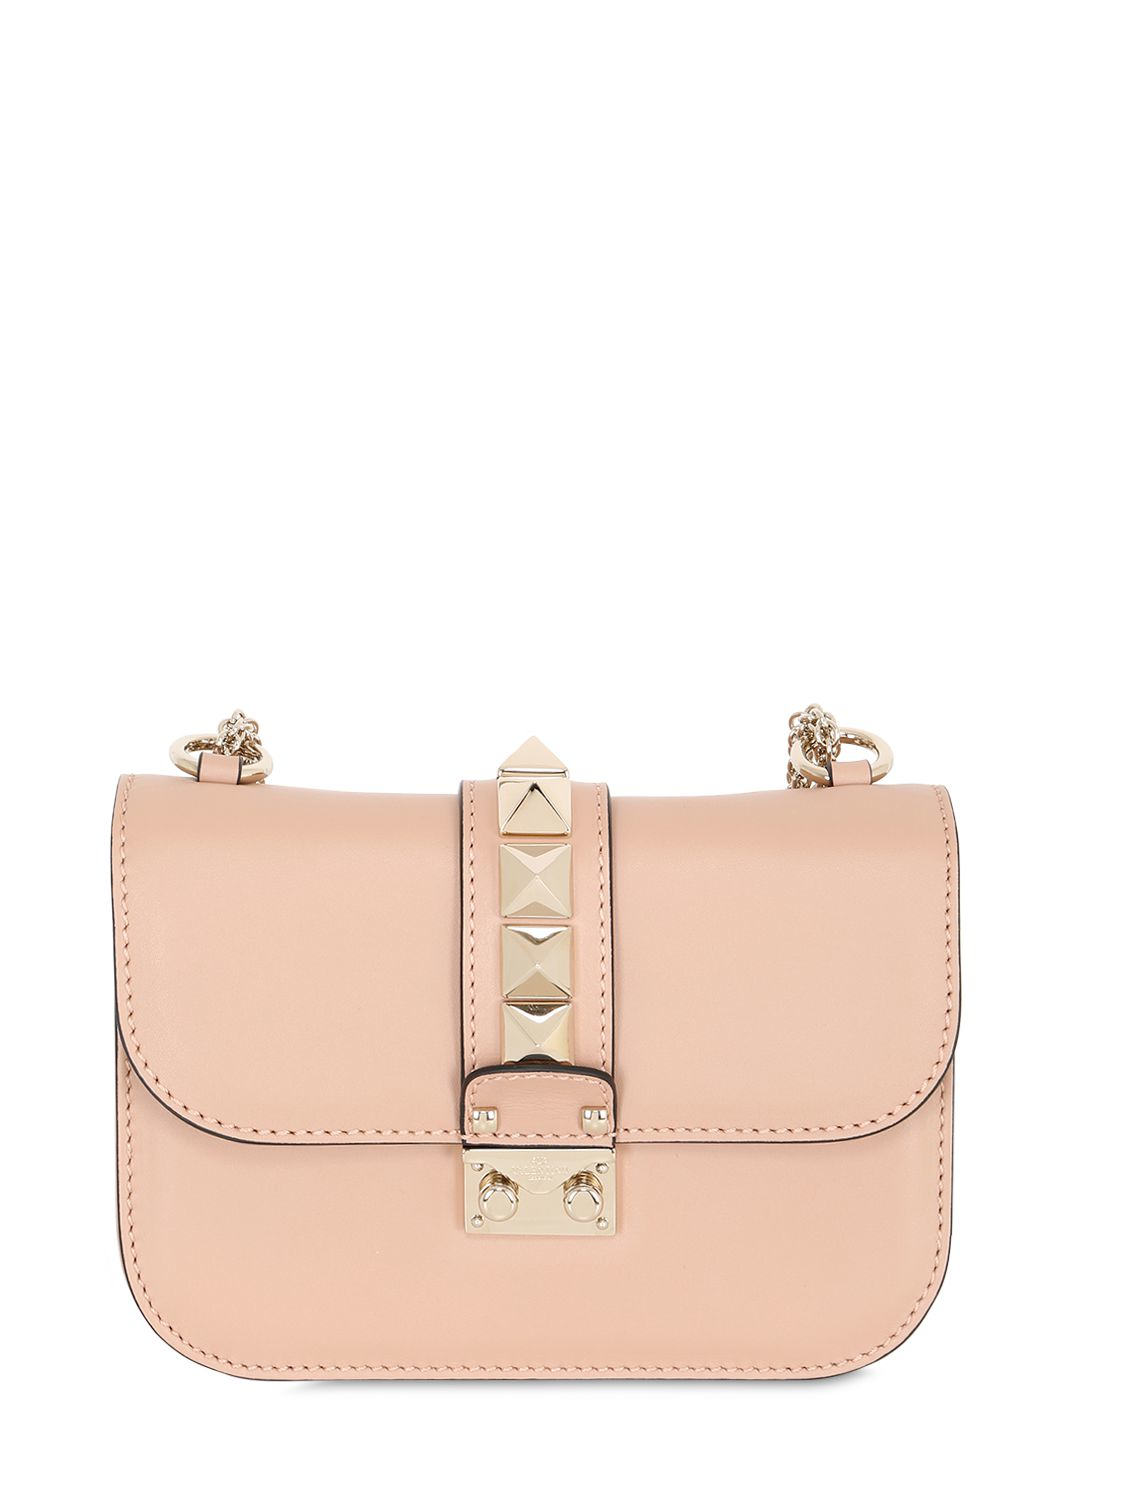 54cbbf6d7e Lyst - Valentino Small Lock Nappa Leather Shoulder Bag in Pink